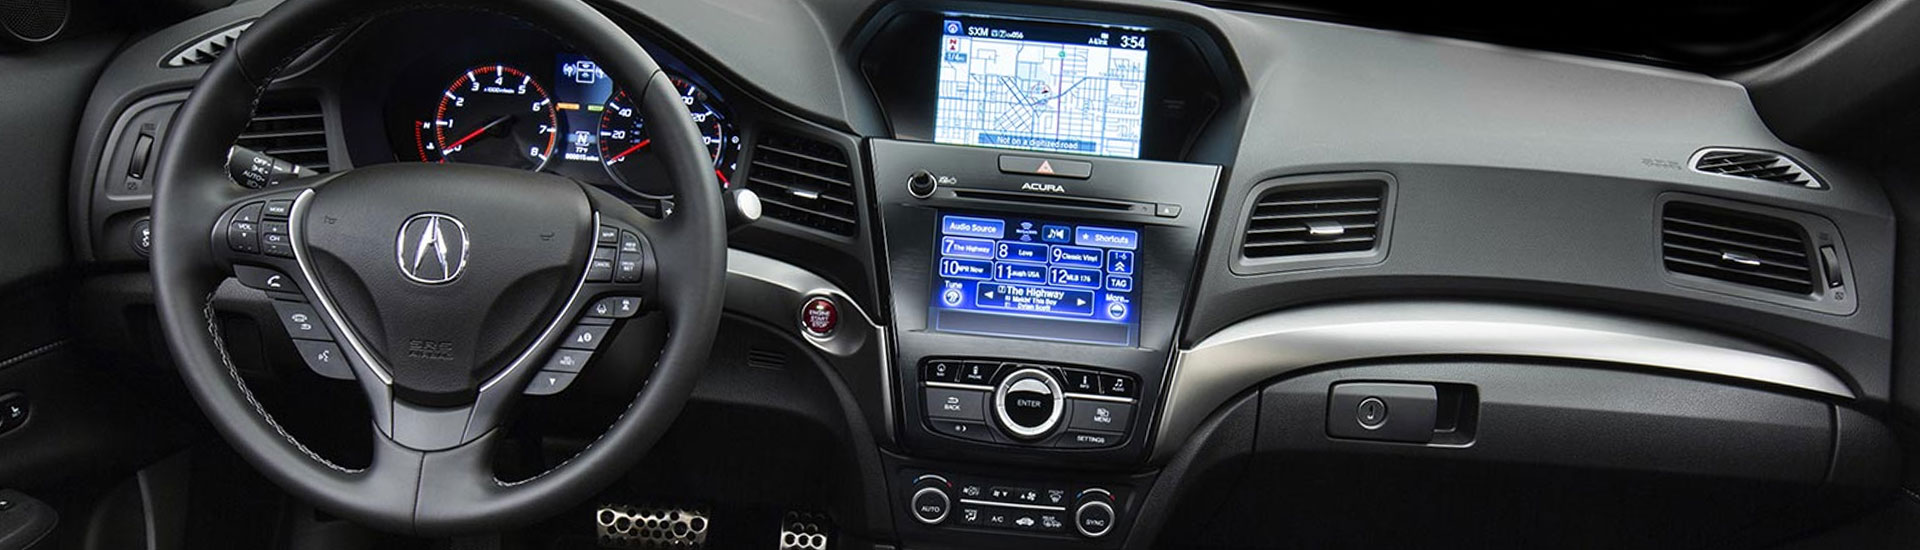 Acura Dash Kits Custom Acura Dash Kit